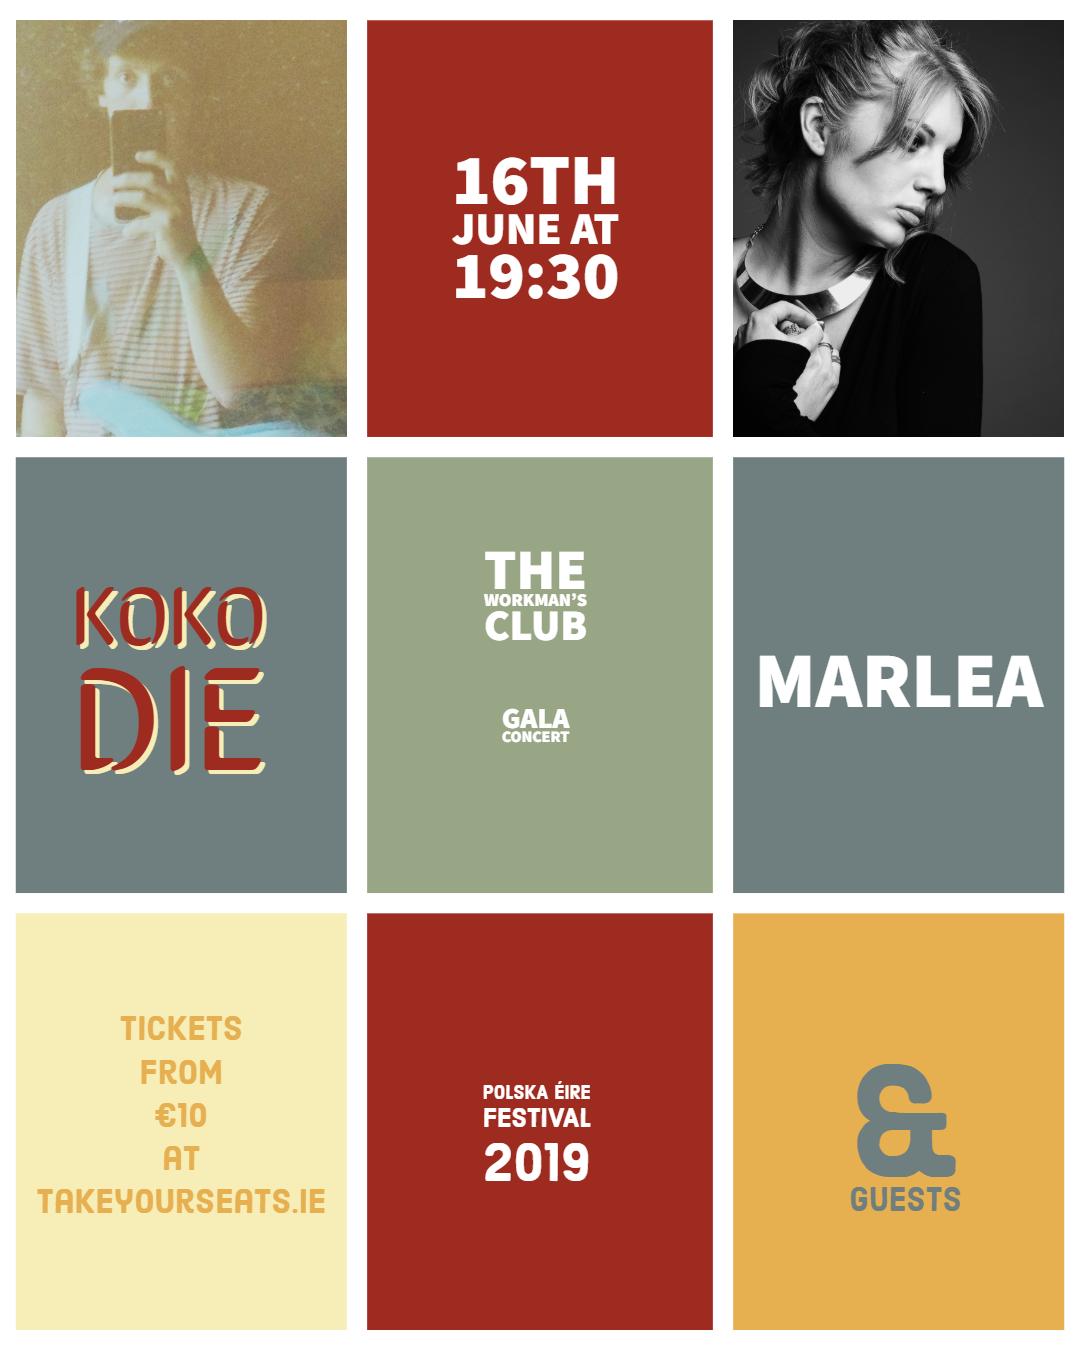 KOKO DIE, Marlea + GUESTS - Koncert Finałowy PolskaÉire Festival 2019